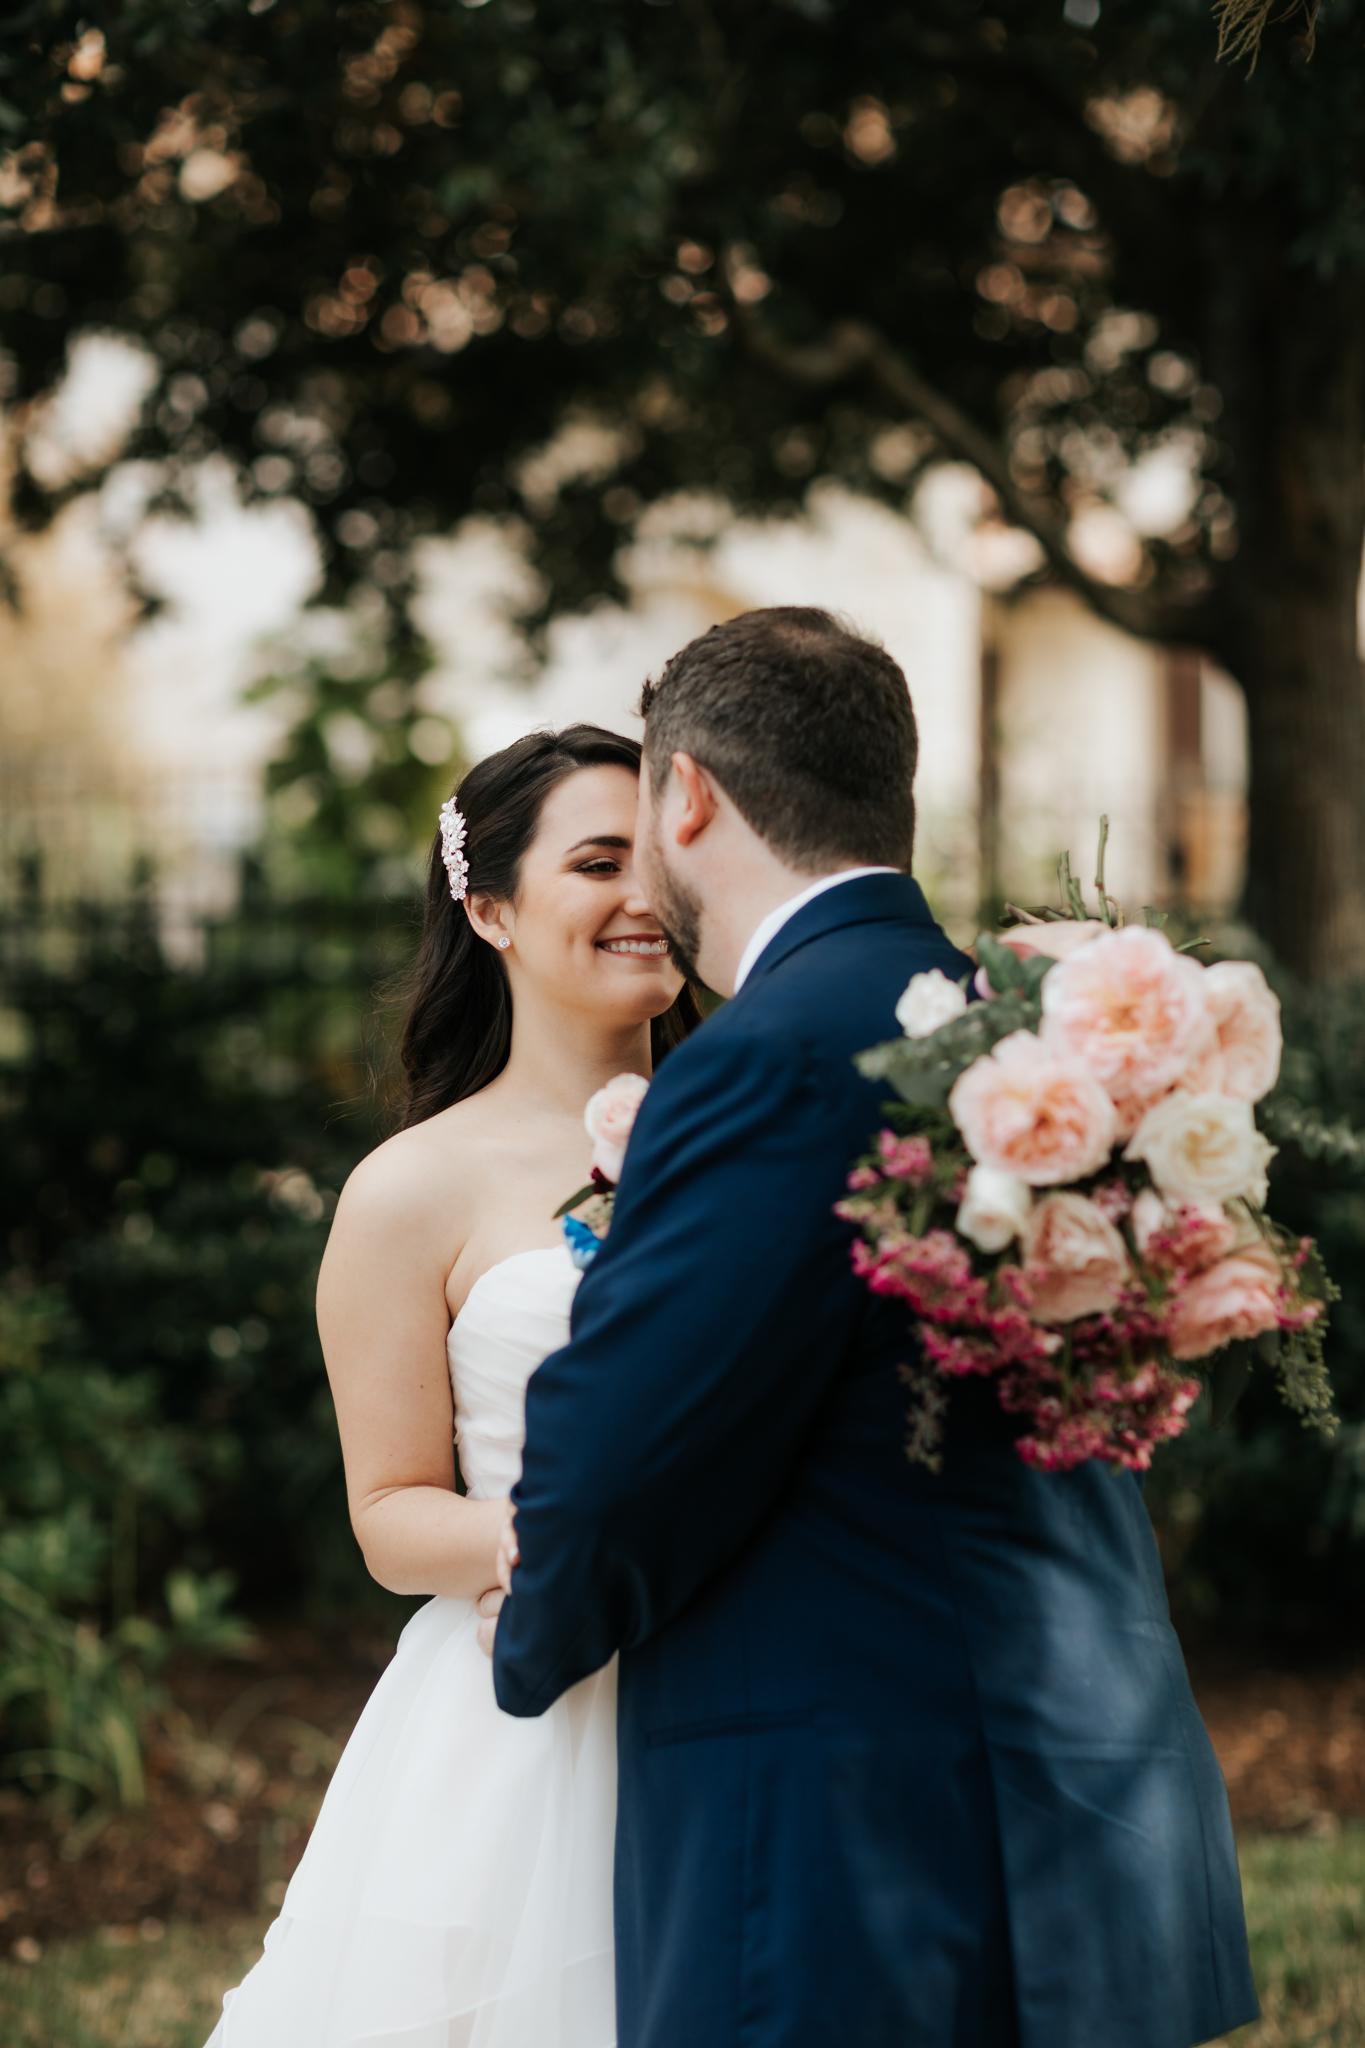 Leah Nicole Photography - Houston Wedding Photographer-Lake Conroe Wedding- Houston Wedding Photographer-21.jpg